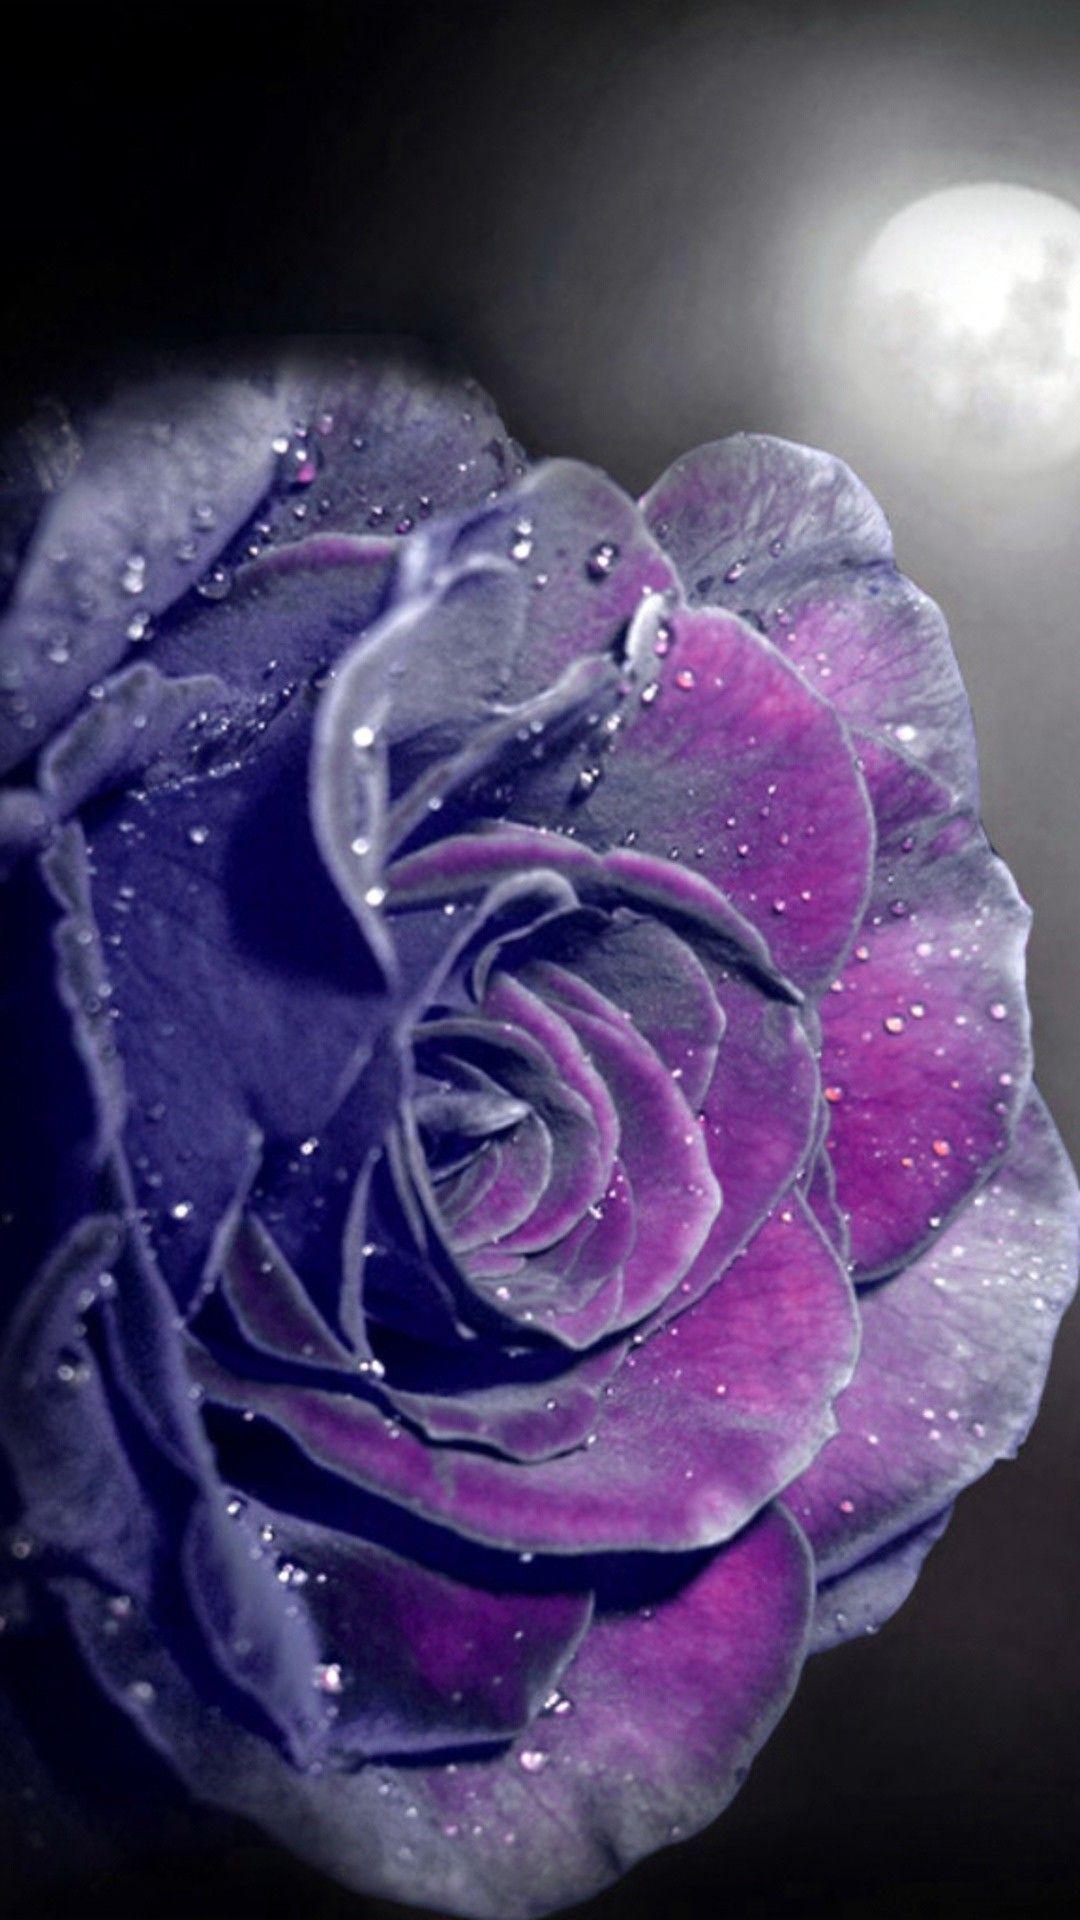 Purple Rose Wallpaper iPhone Best HD Wallpapers